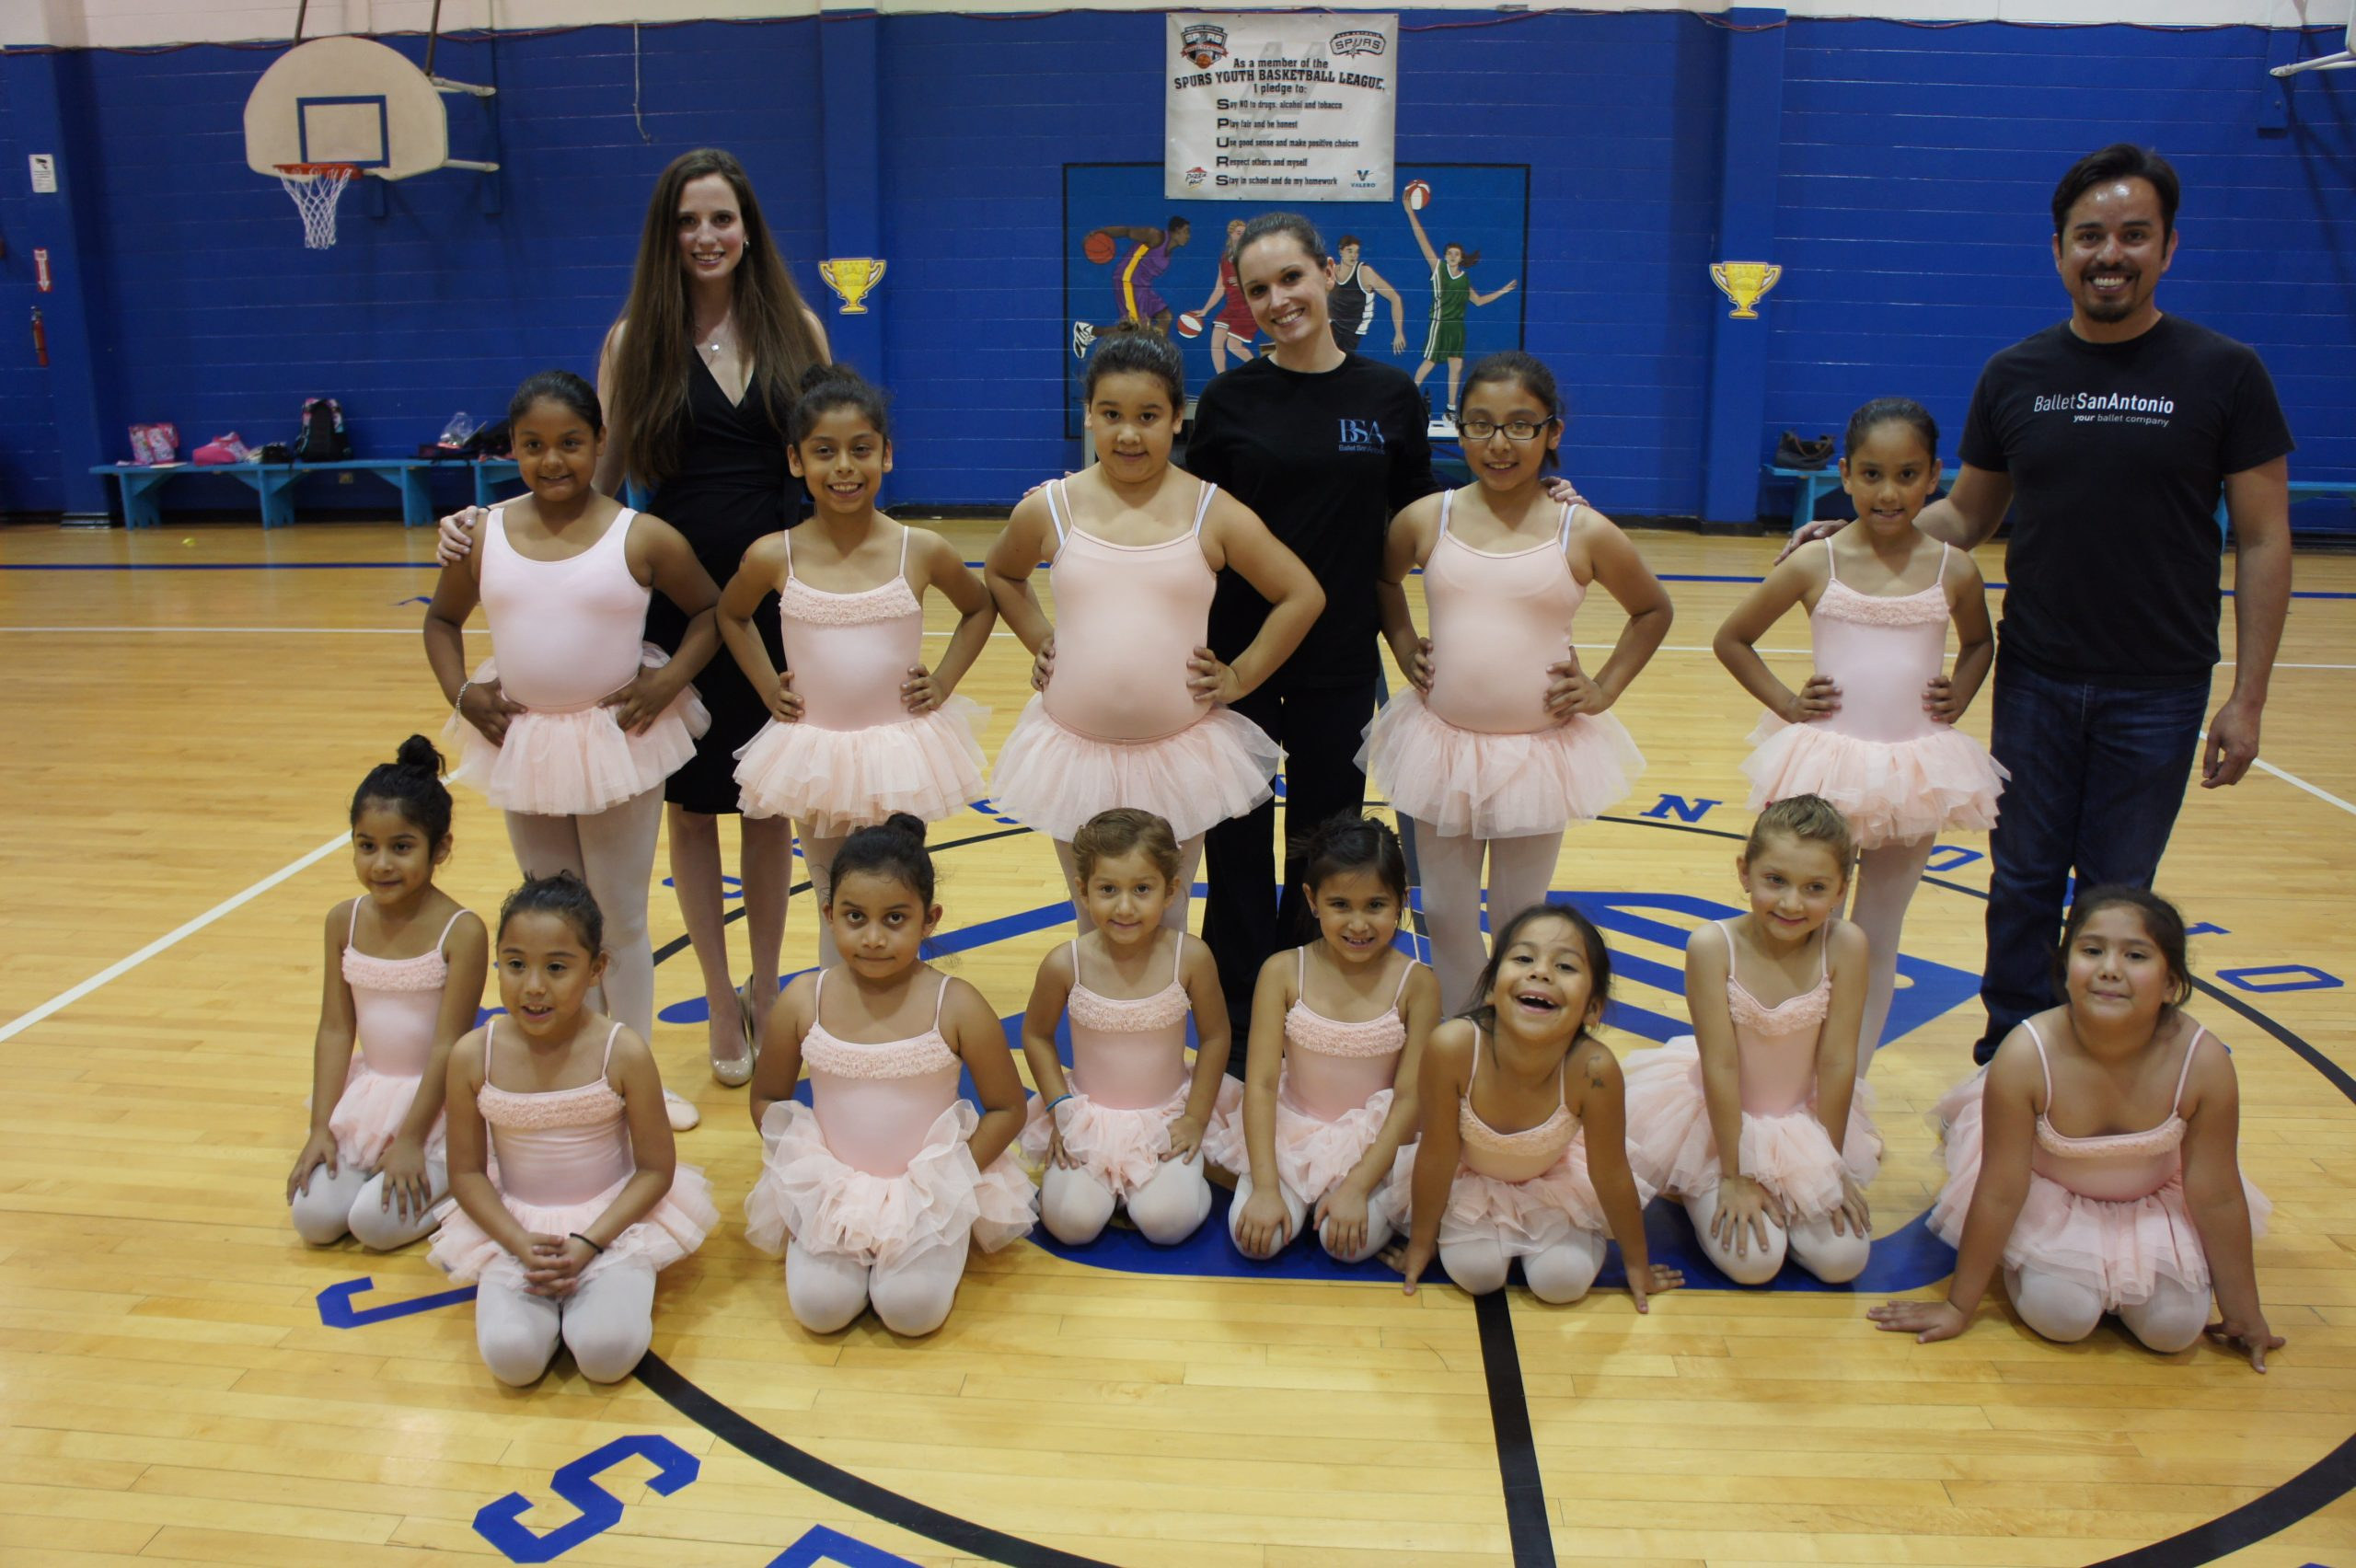 The Boys and Girls Club Ballet class with Courtney Barker (far left) and Gabriel Zertuche (far right). Courtesy Ballet San Antonio.